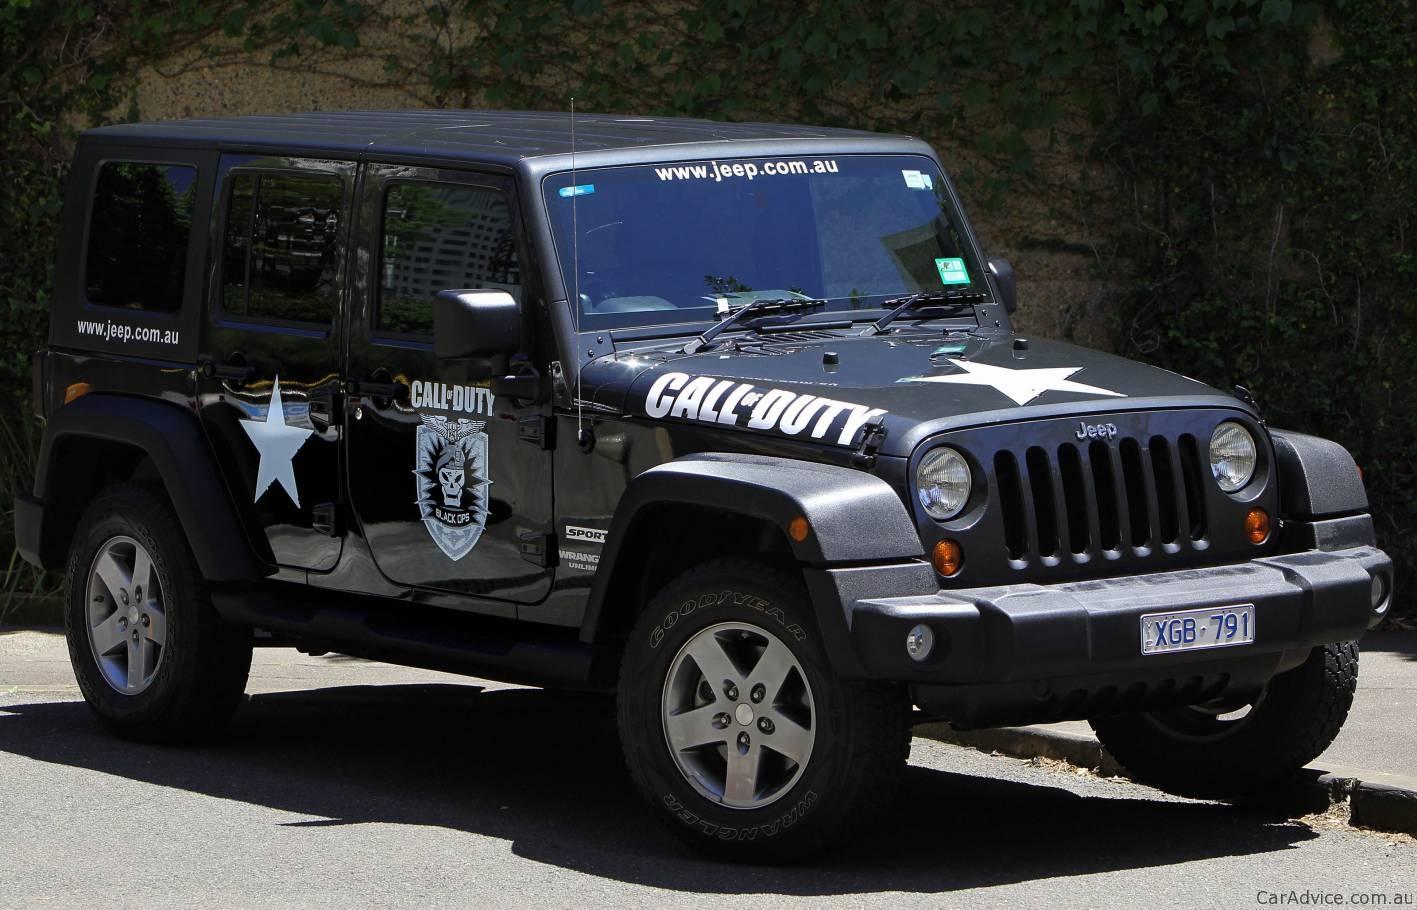 Duty Black Ops Jeep Wrangler Unlimited Wallpaper Download Free